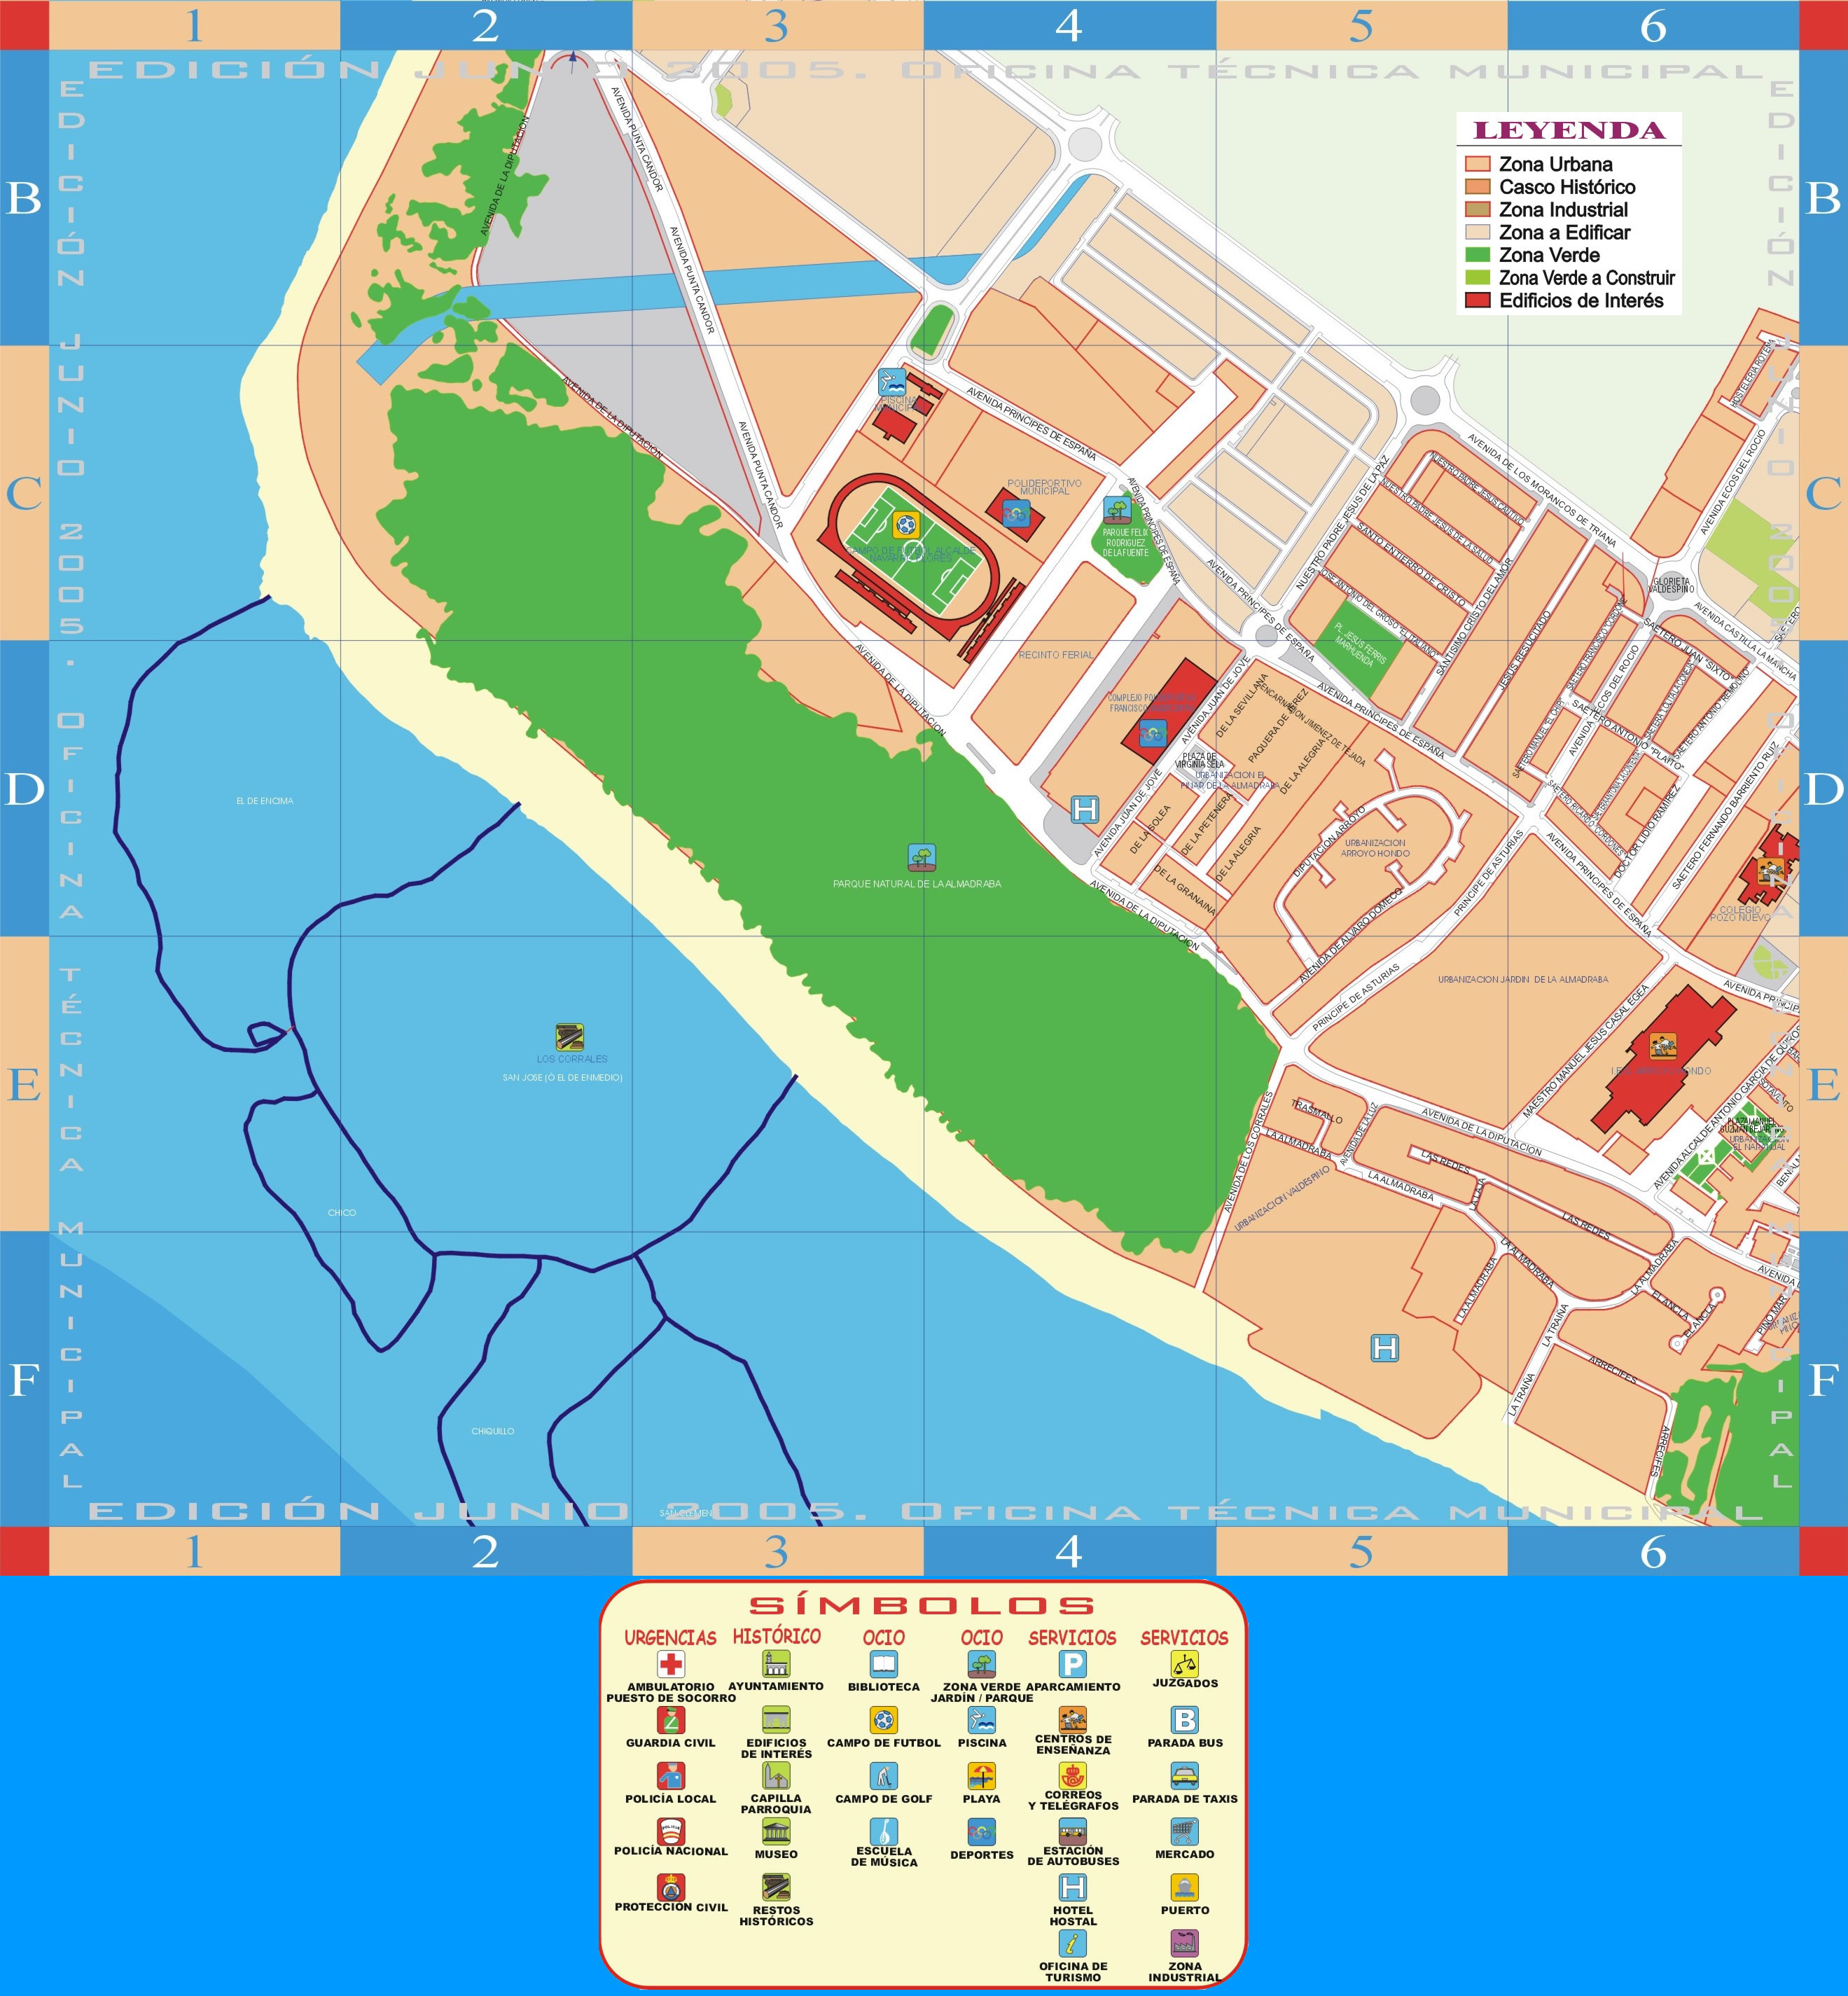 Rota map 2005 - part 1